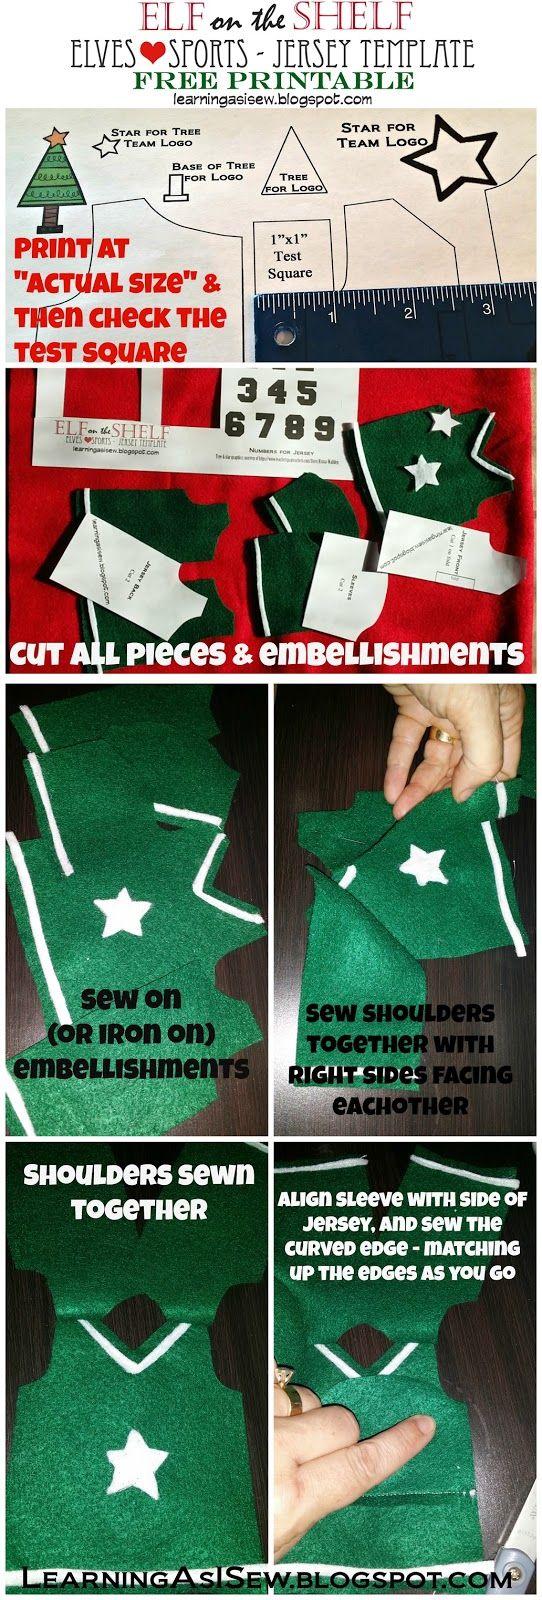 Elf on the Shelf: Free Sports Jersey Printable